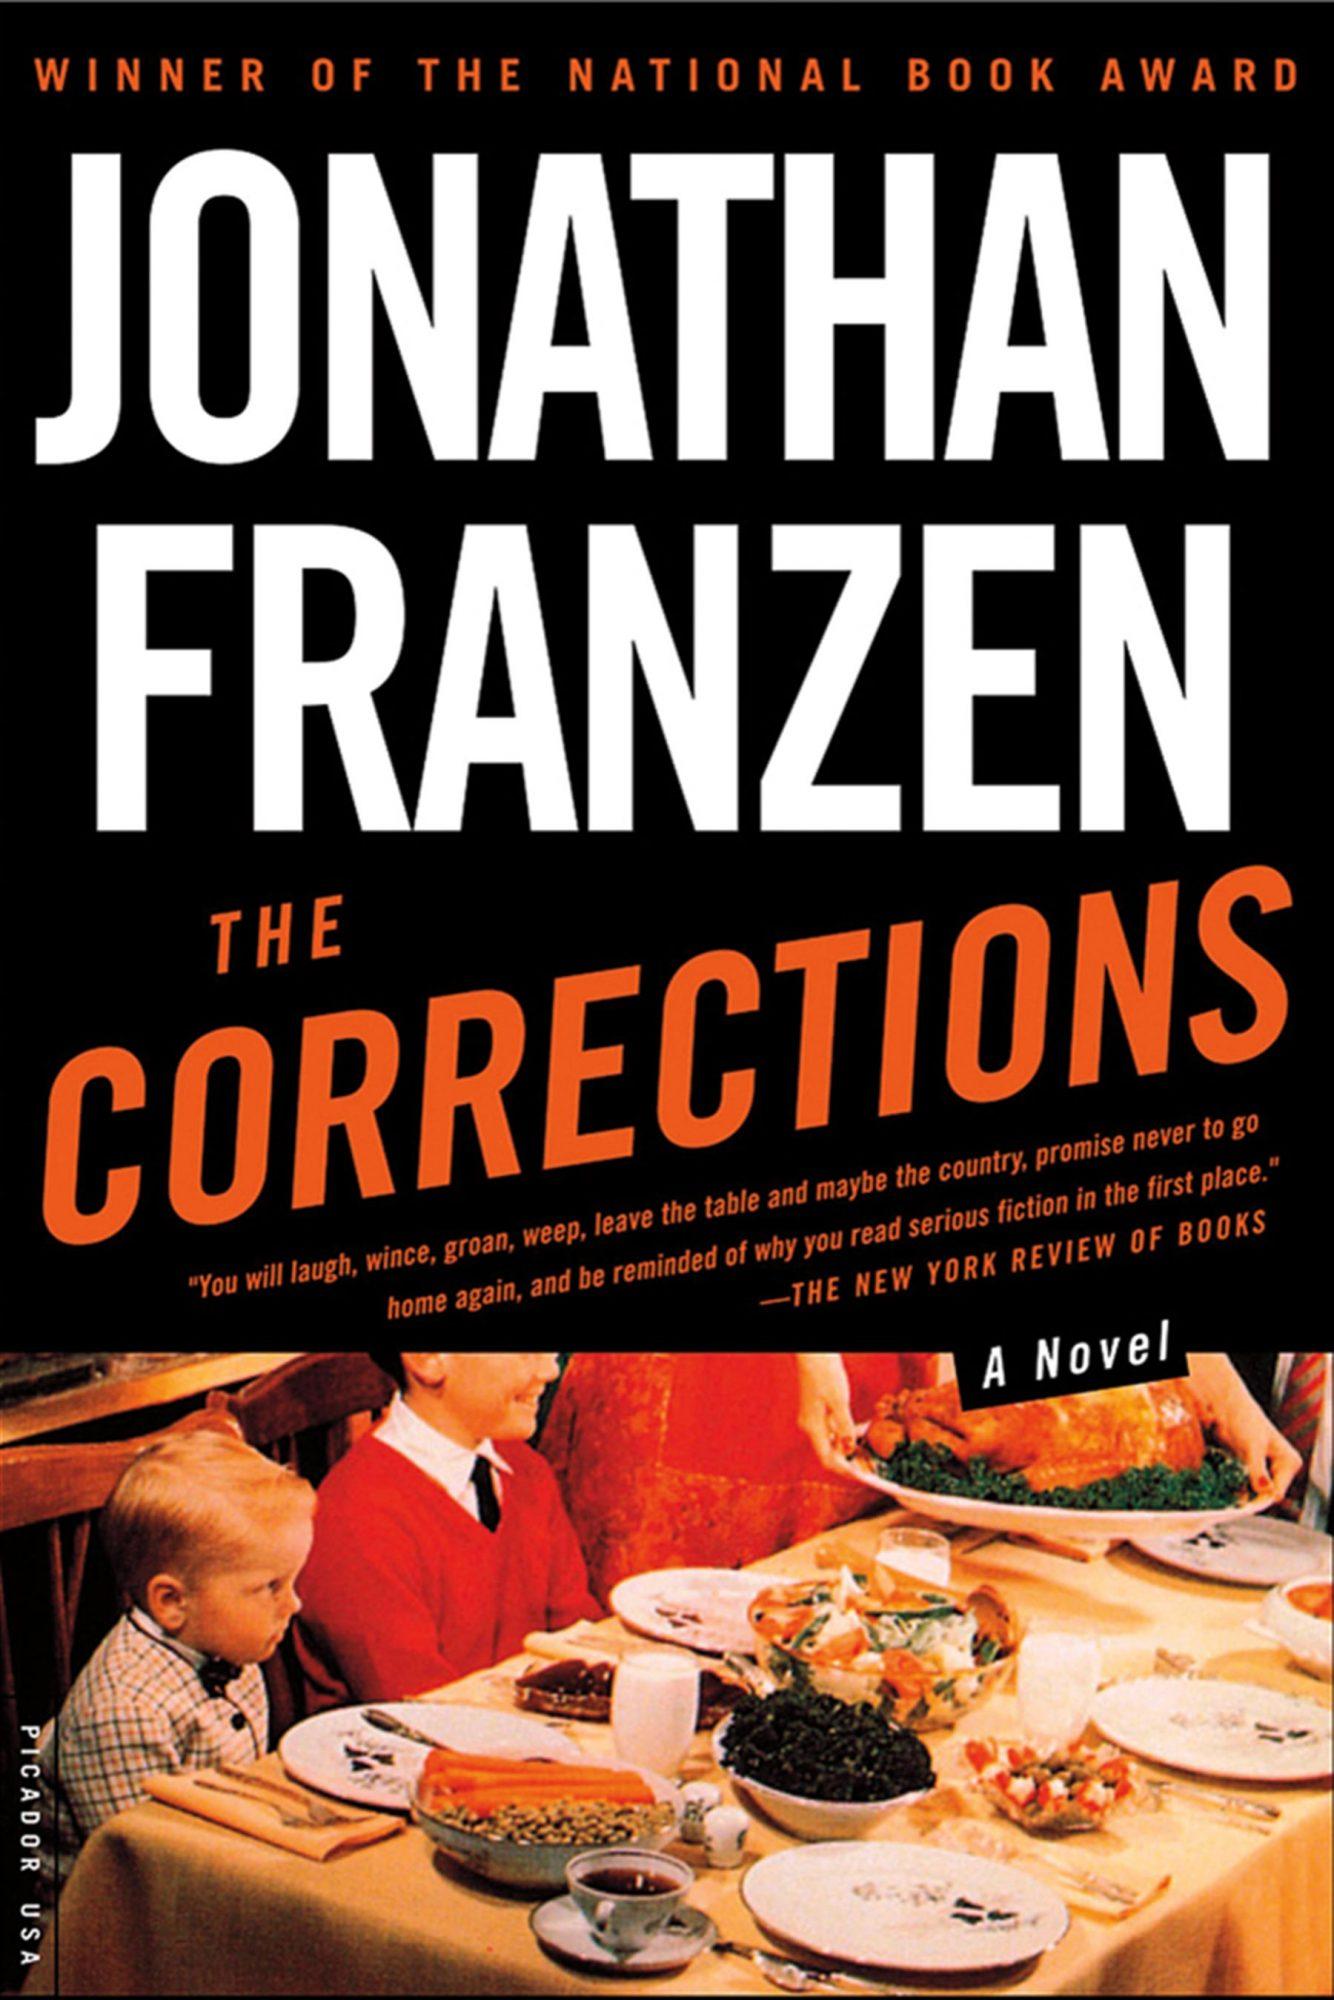 The Corrections  A Novel - paperback (8/27/2002)by Jonathan Franzen